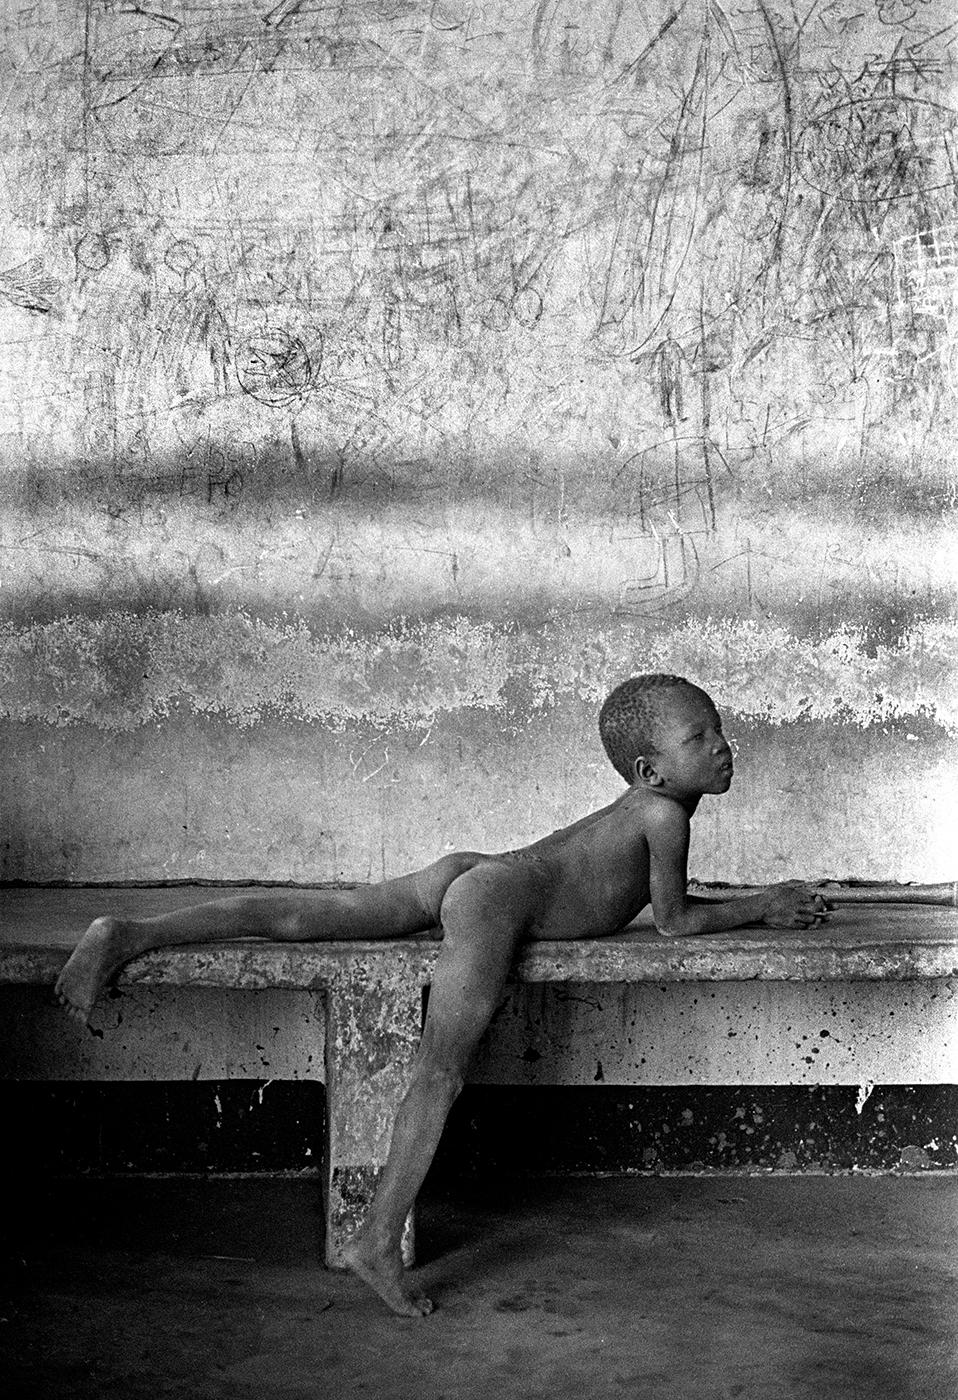 South Sudan, 1990